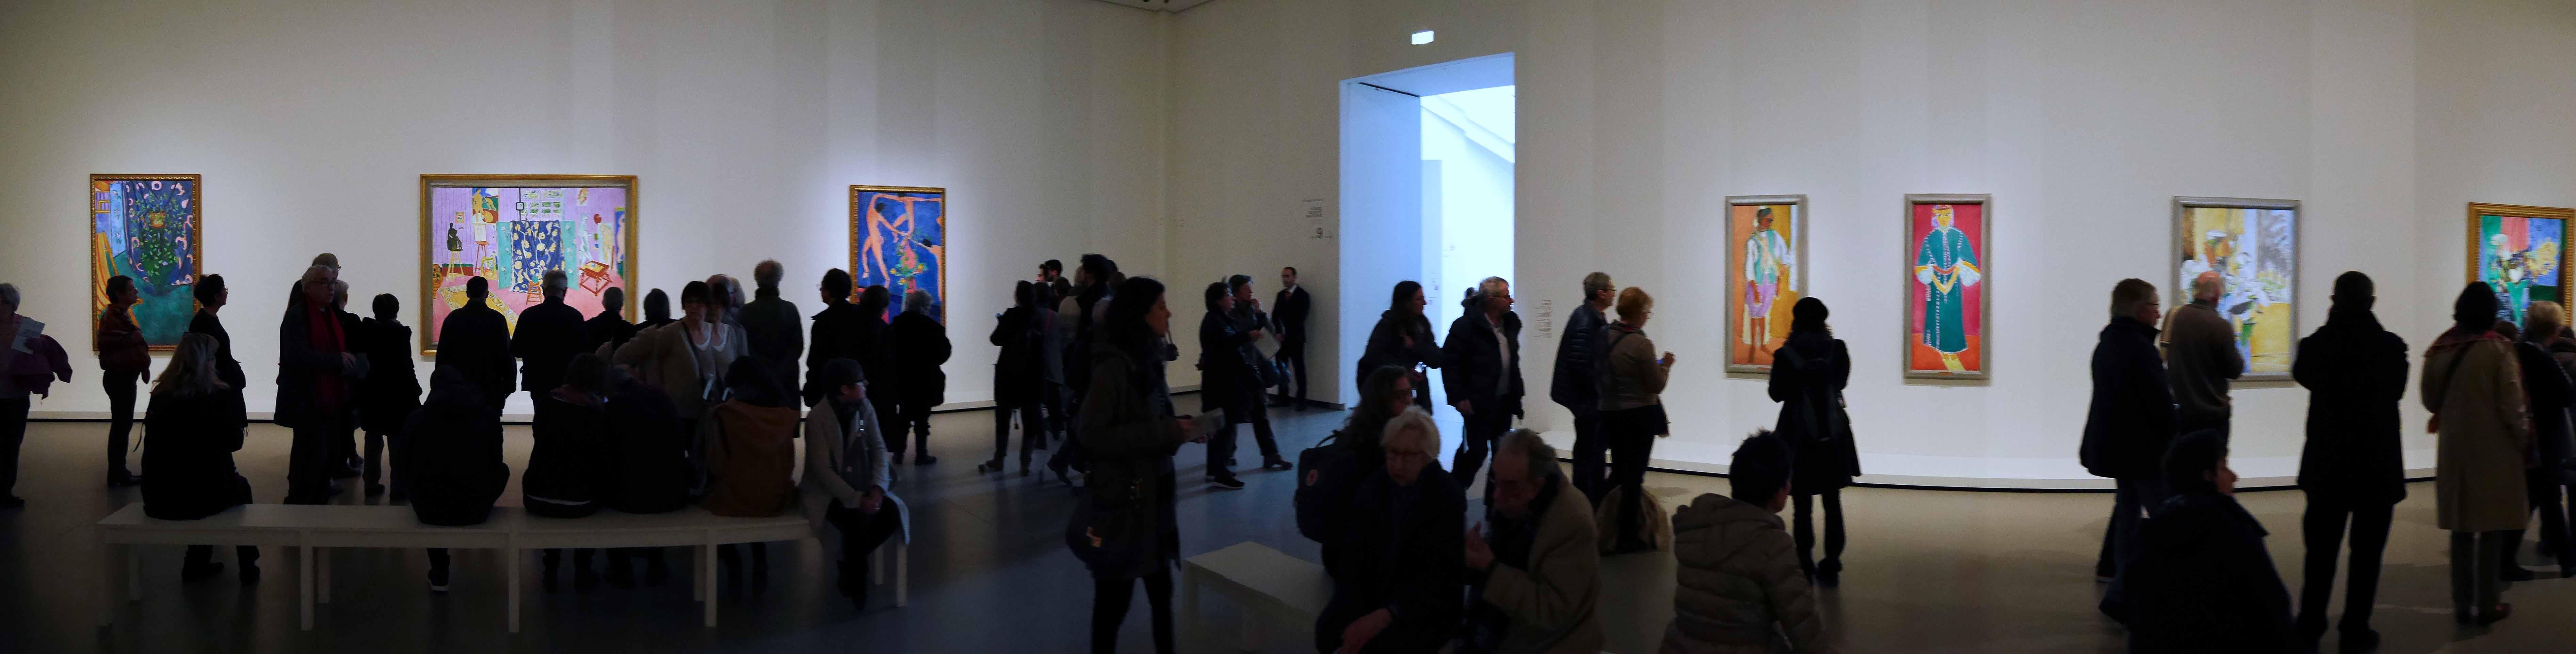 f056c886eb 51. Alan Gouk writes on the Shchukin Collection at Fondation Louis ...